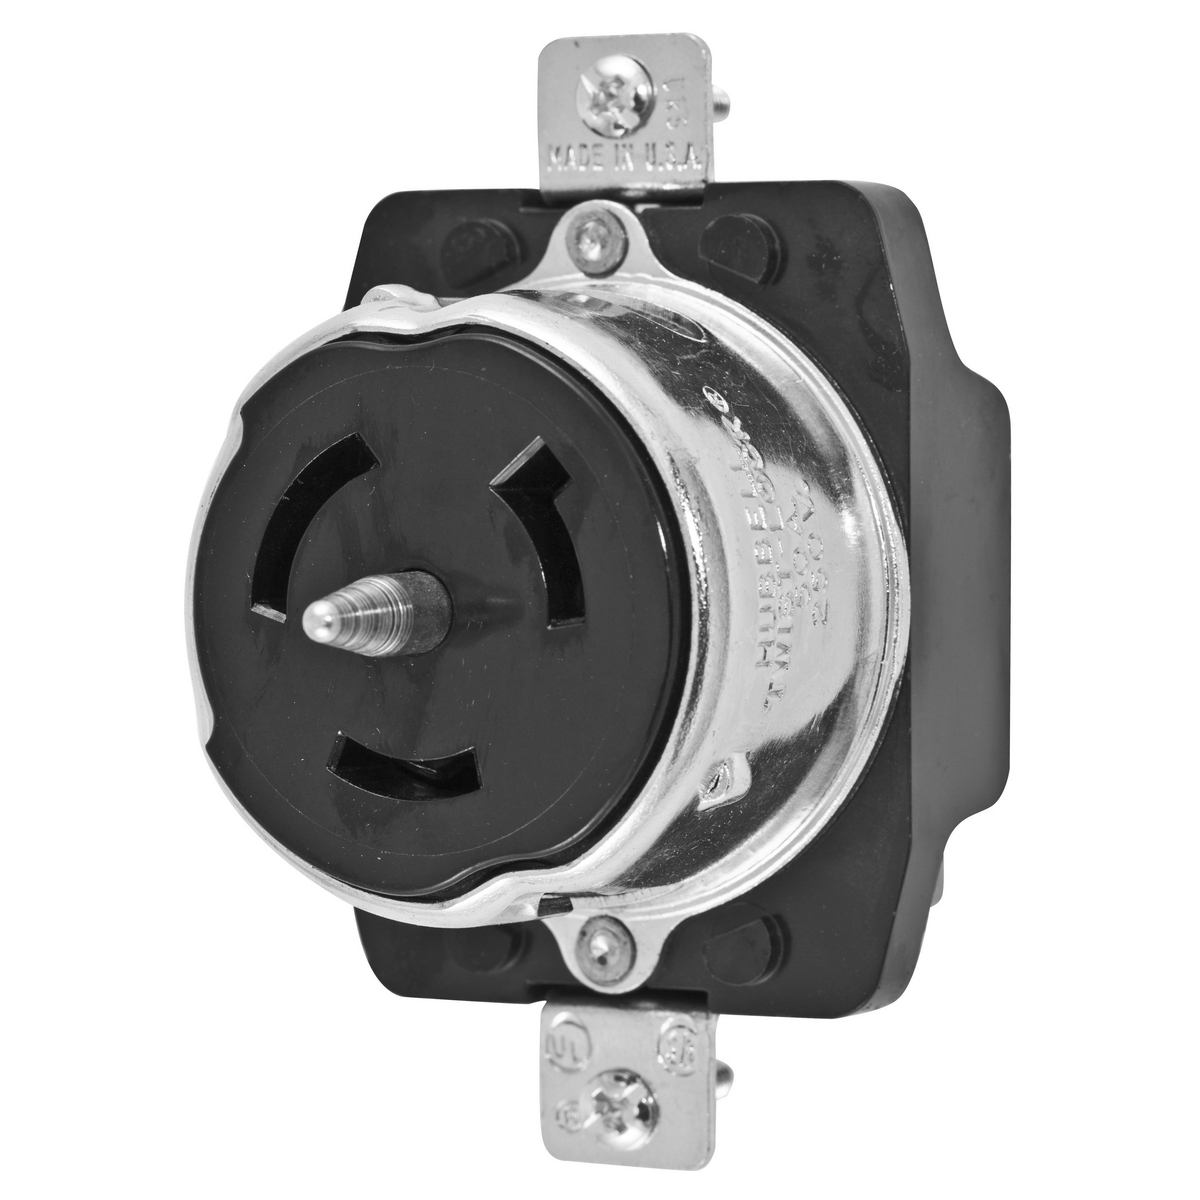 Cs8269 Brand Wiring Device Kellems